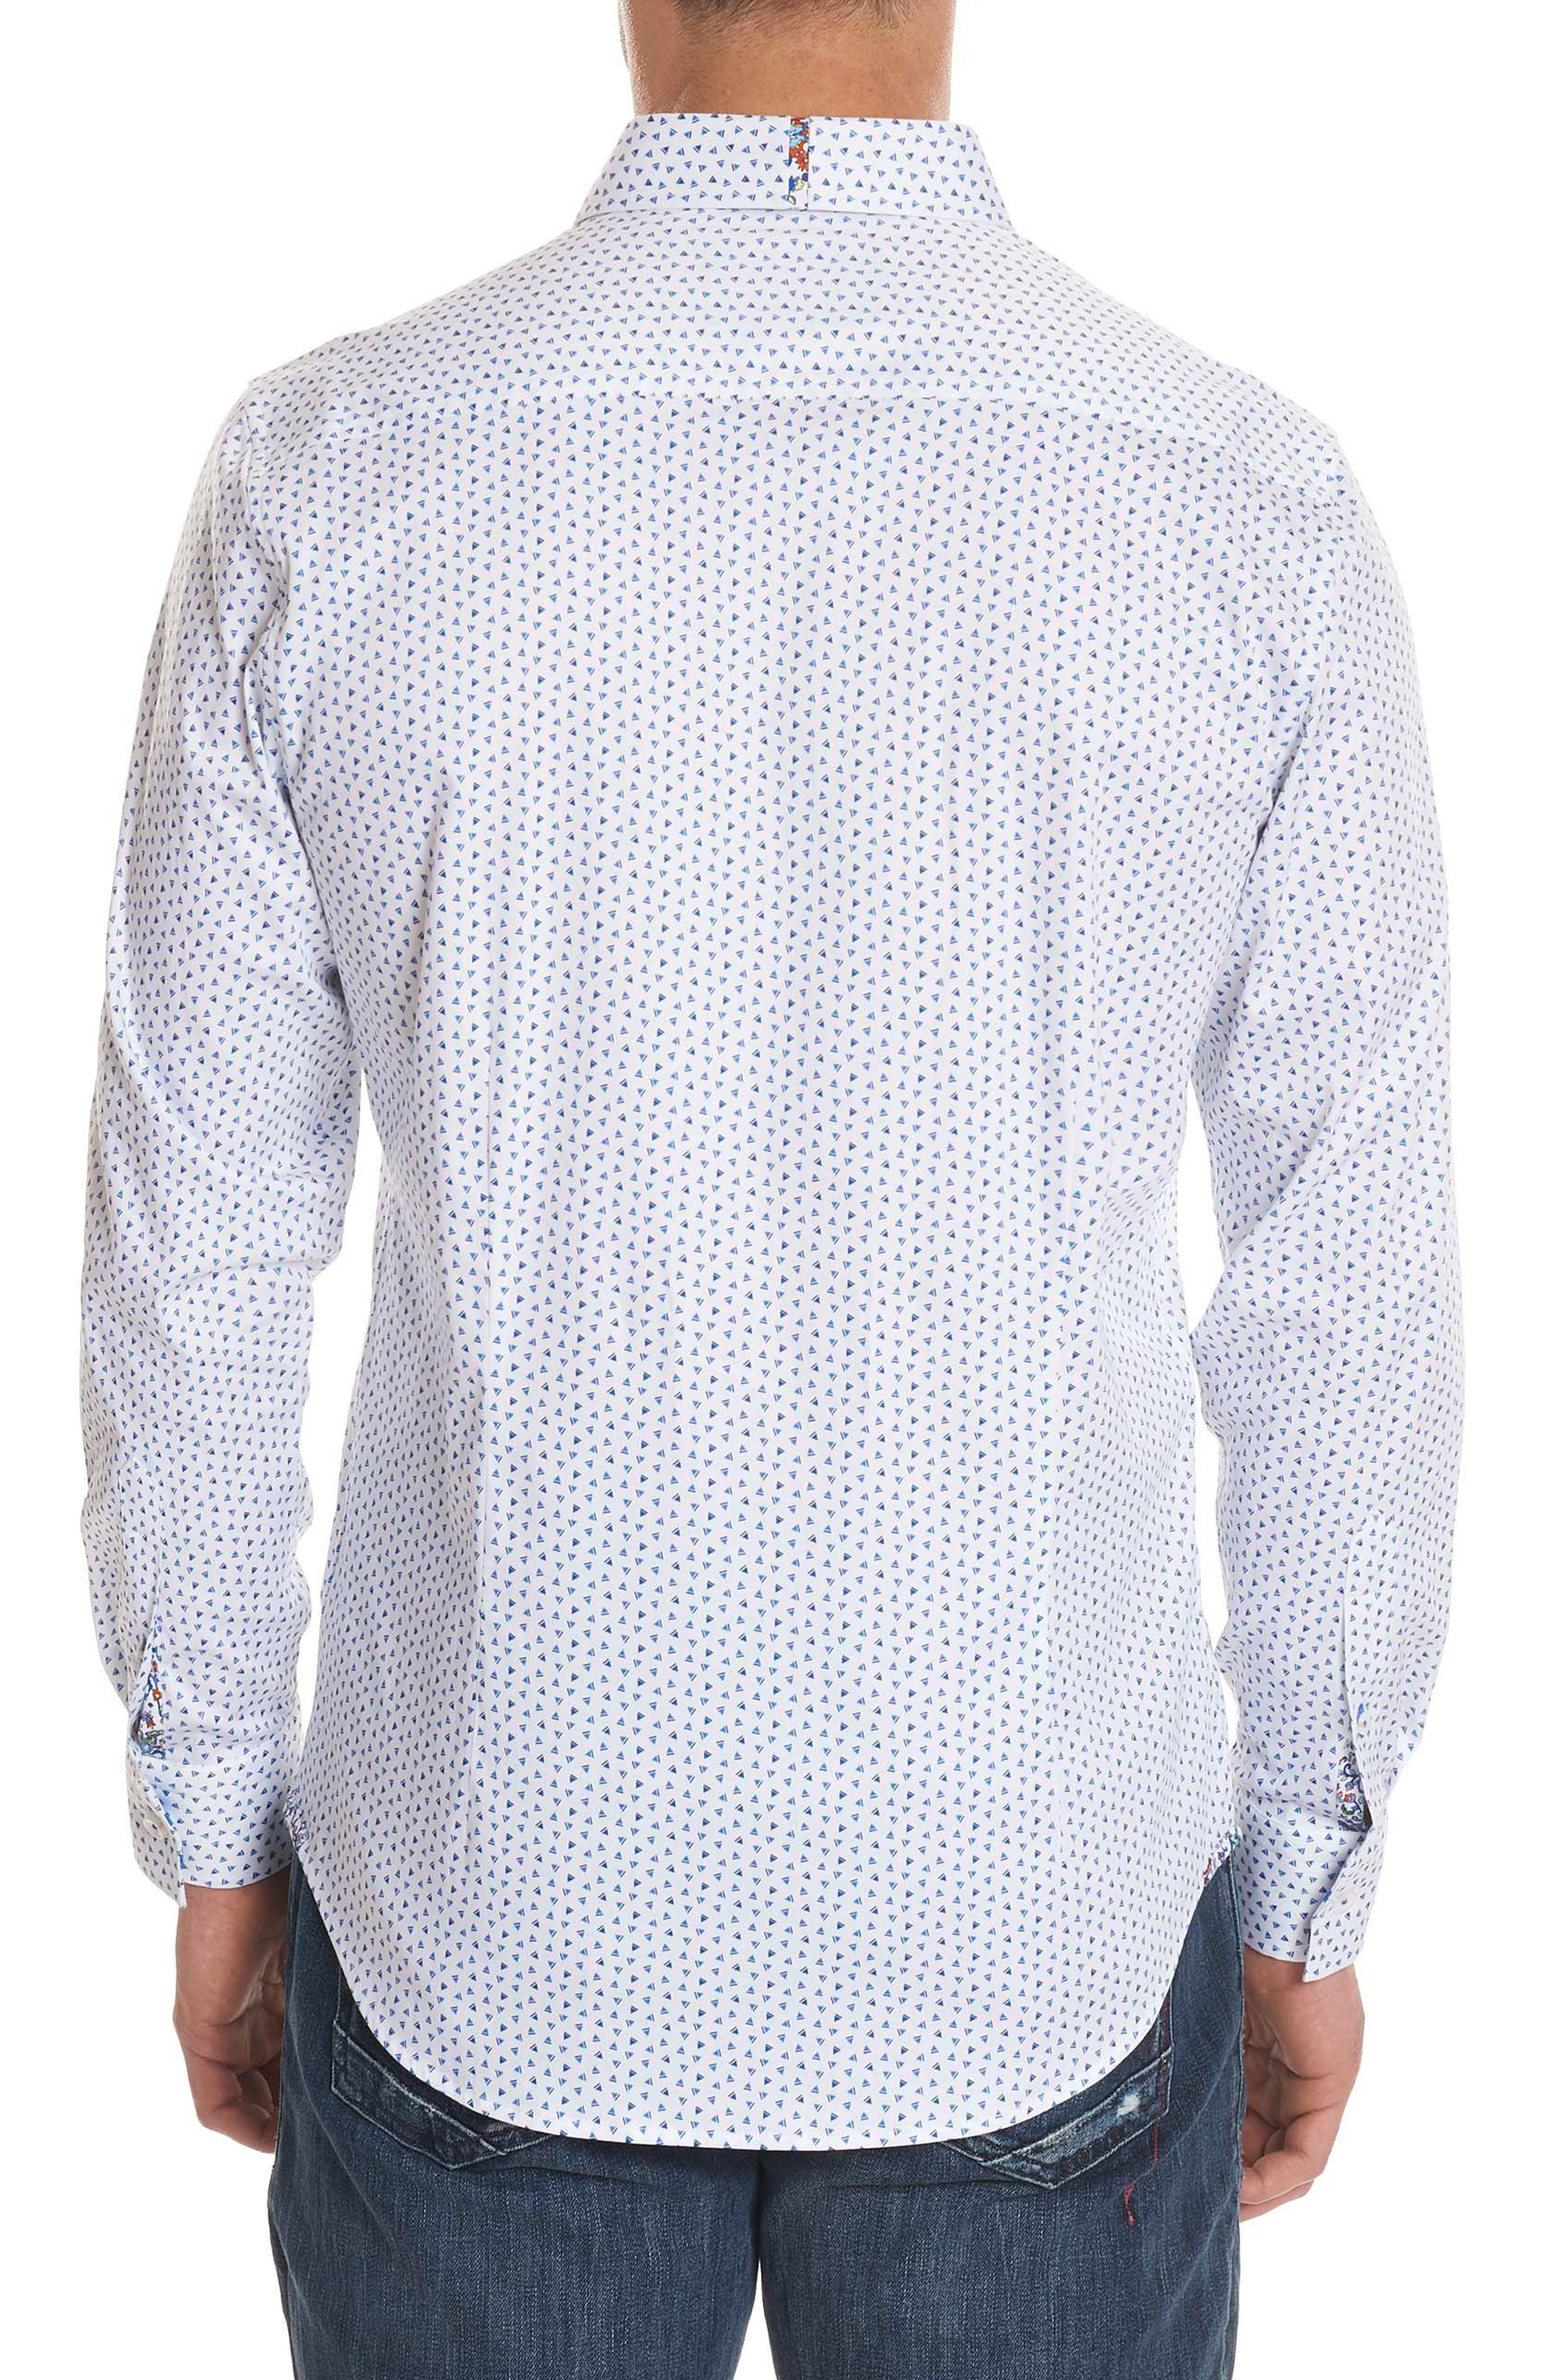 Mitchel Tailored Fit Sport Shirt,                             Alternate thumbnail 2, color,                             Blue